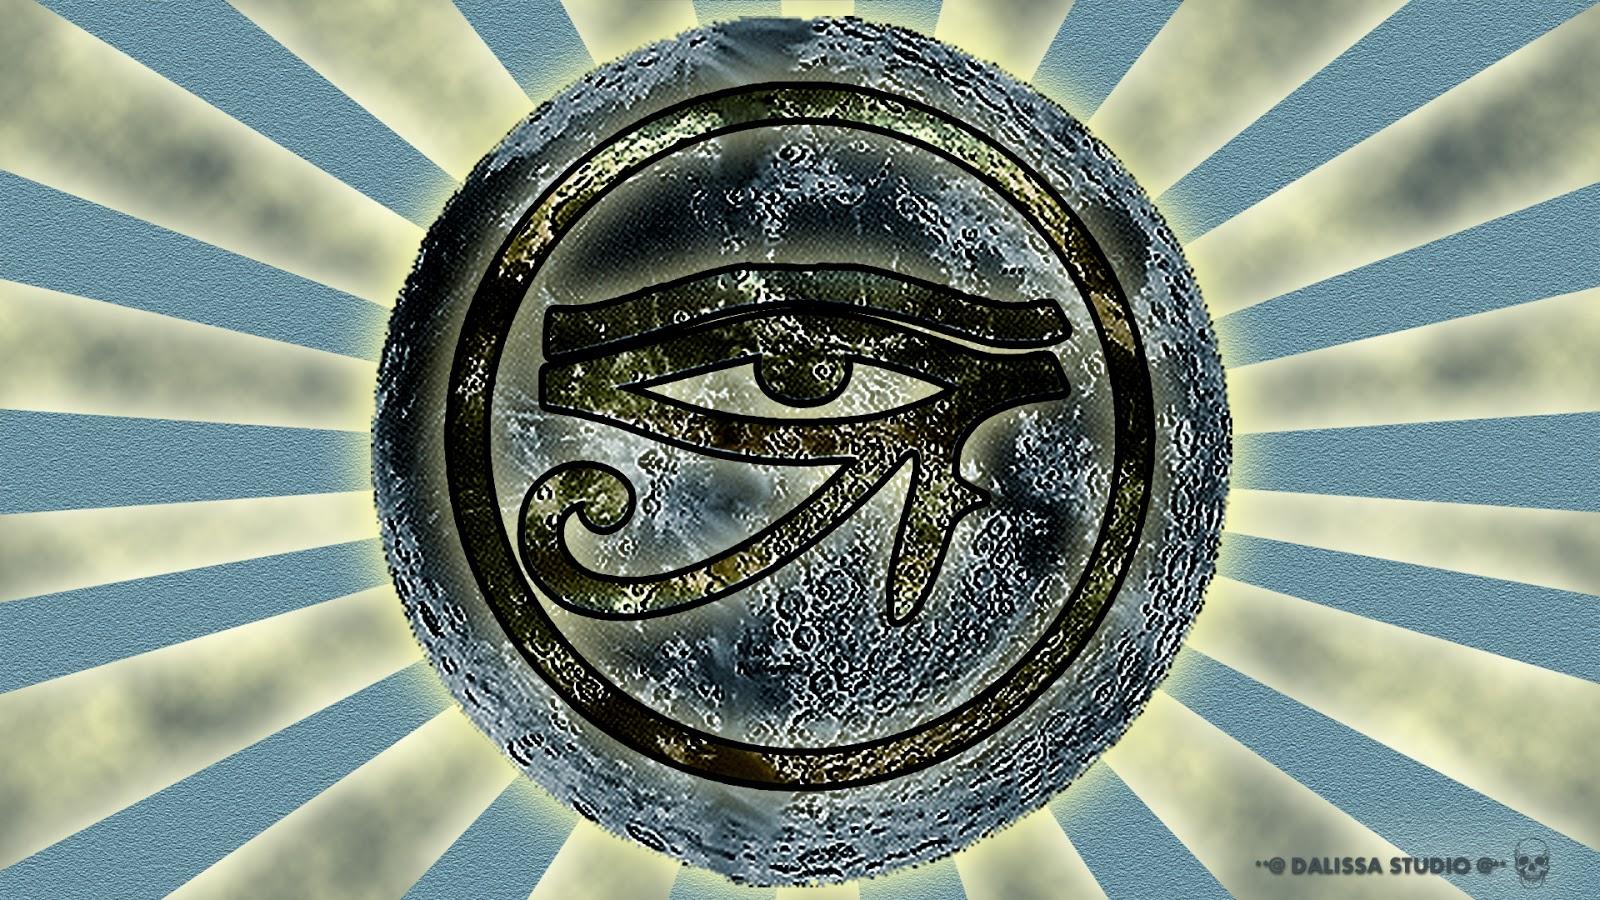 Eye Of Horus Trippy Wallpaper